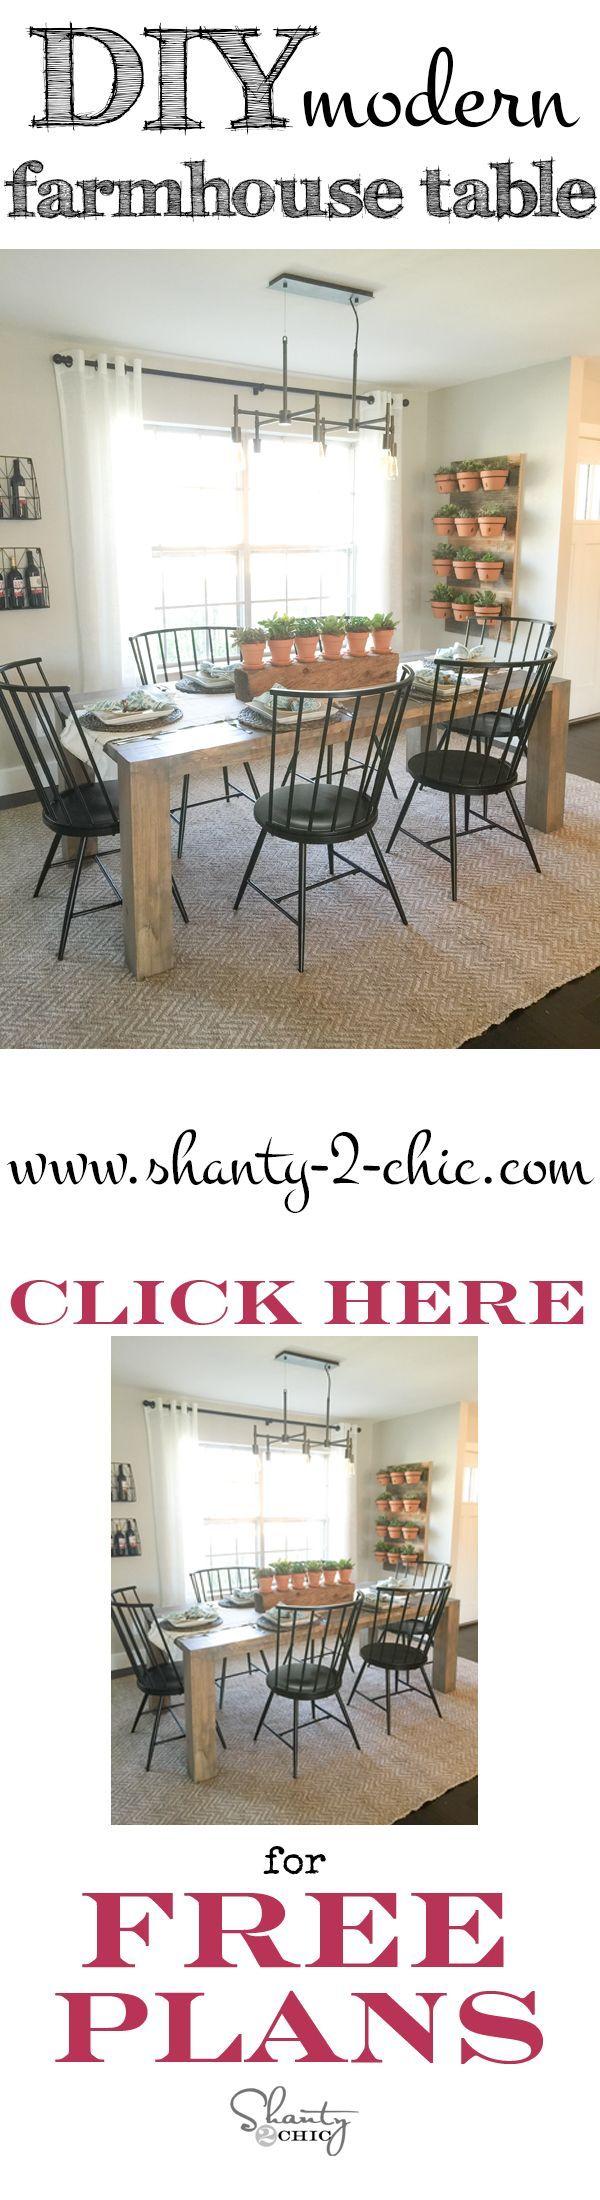 Best 25 Modern farmhouse table ideas on Pinterest Dining room